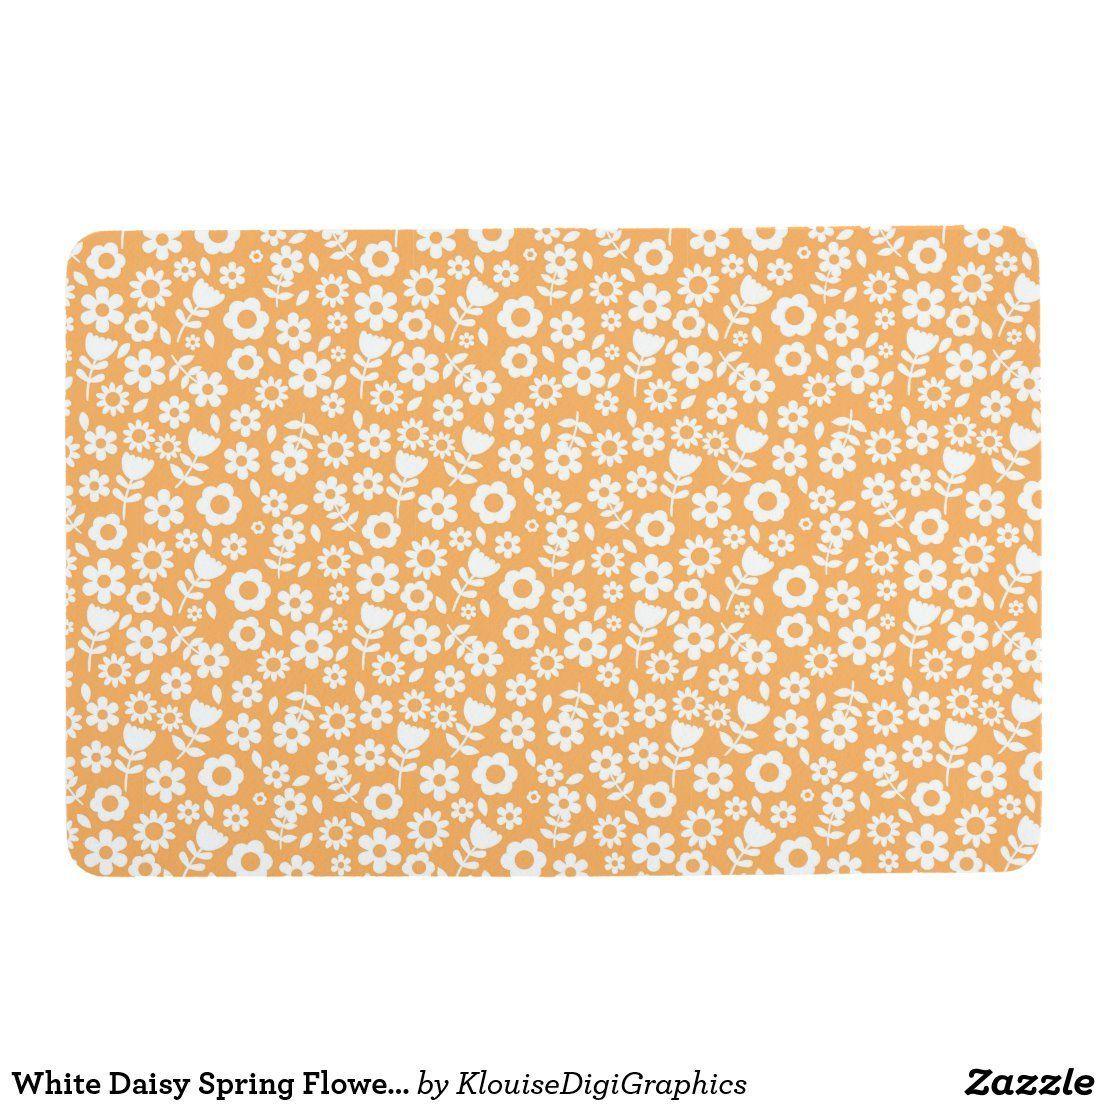 White Daisy Spring Flowers on Bright Orange Floor Mat | Zazzle.com#bright #daisy #floor #flowers #mat #orange #spring #white #zazzlecom